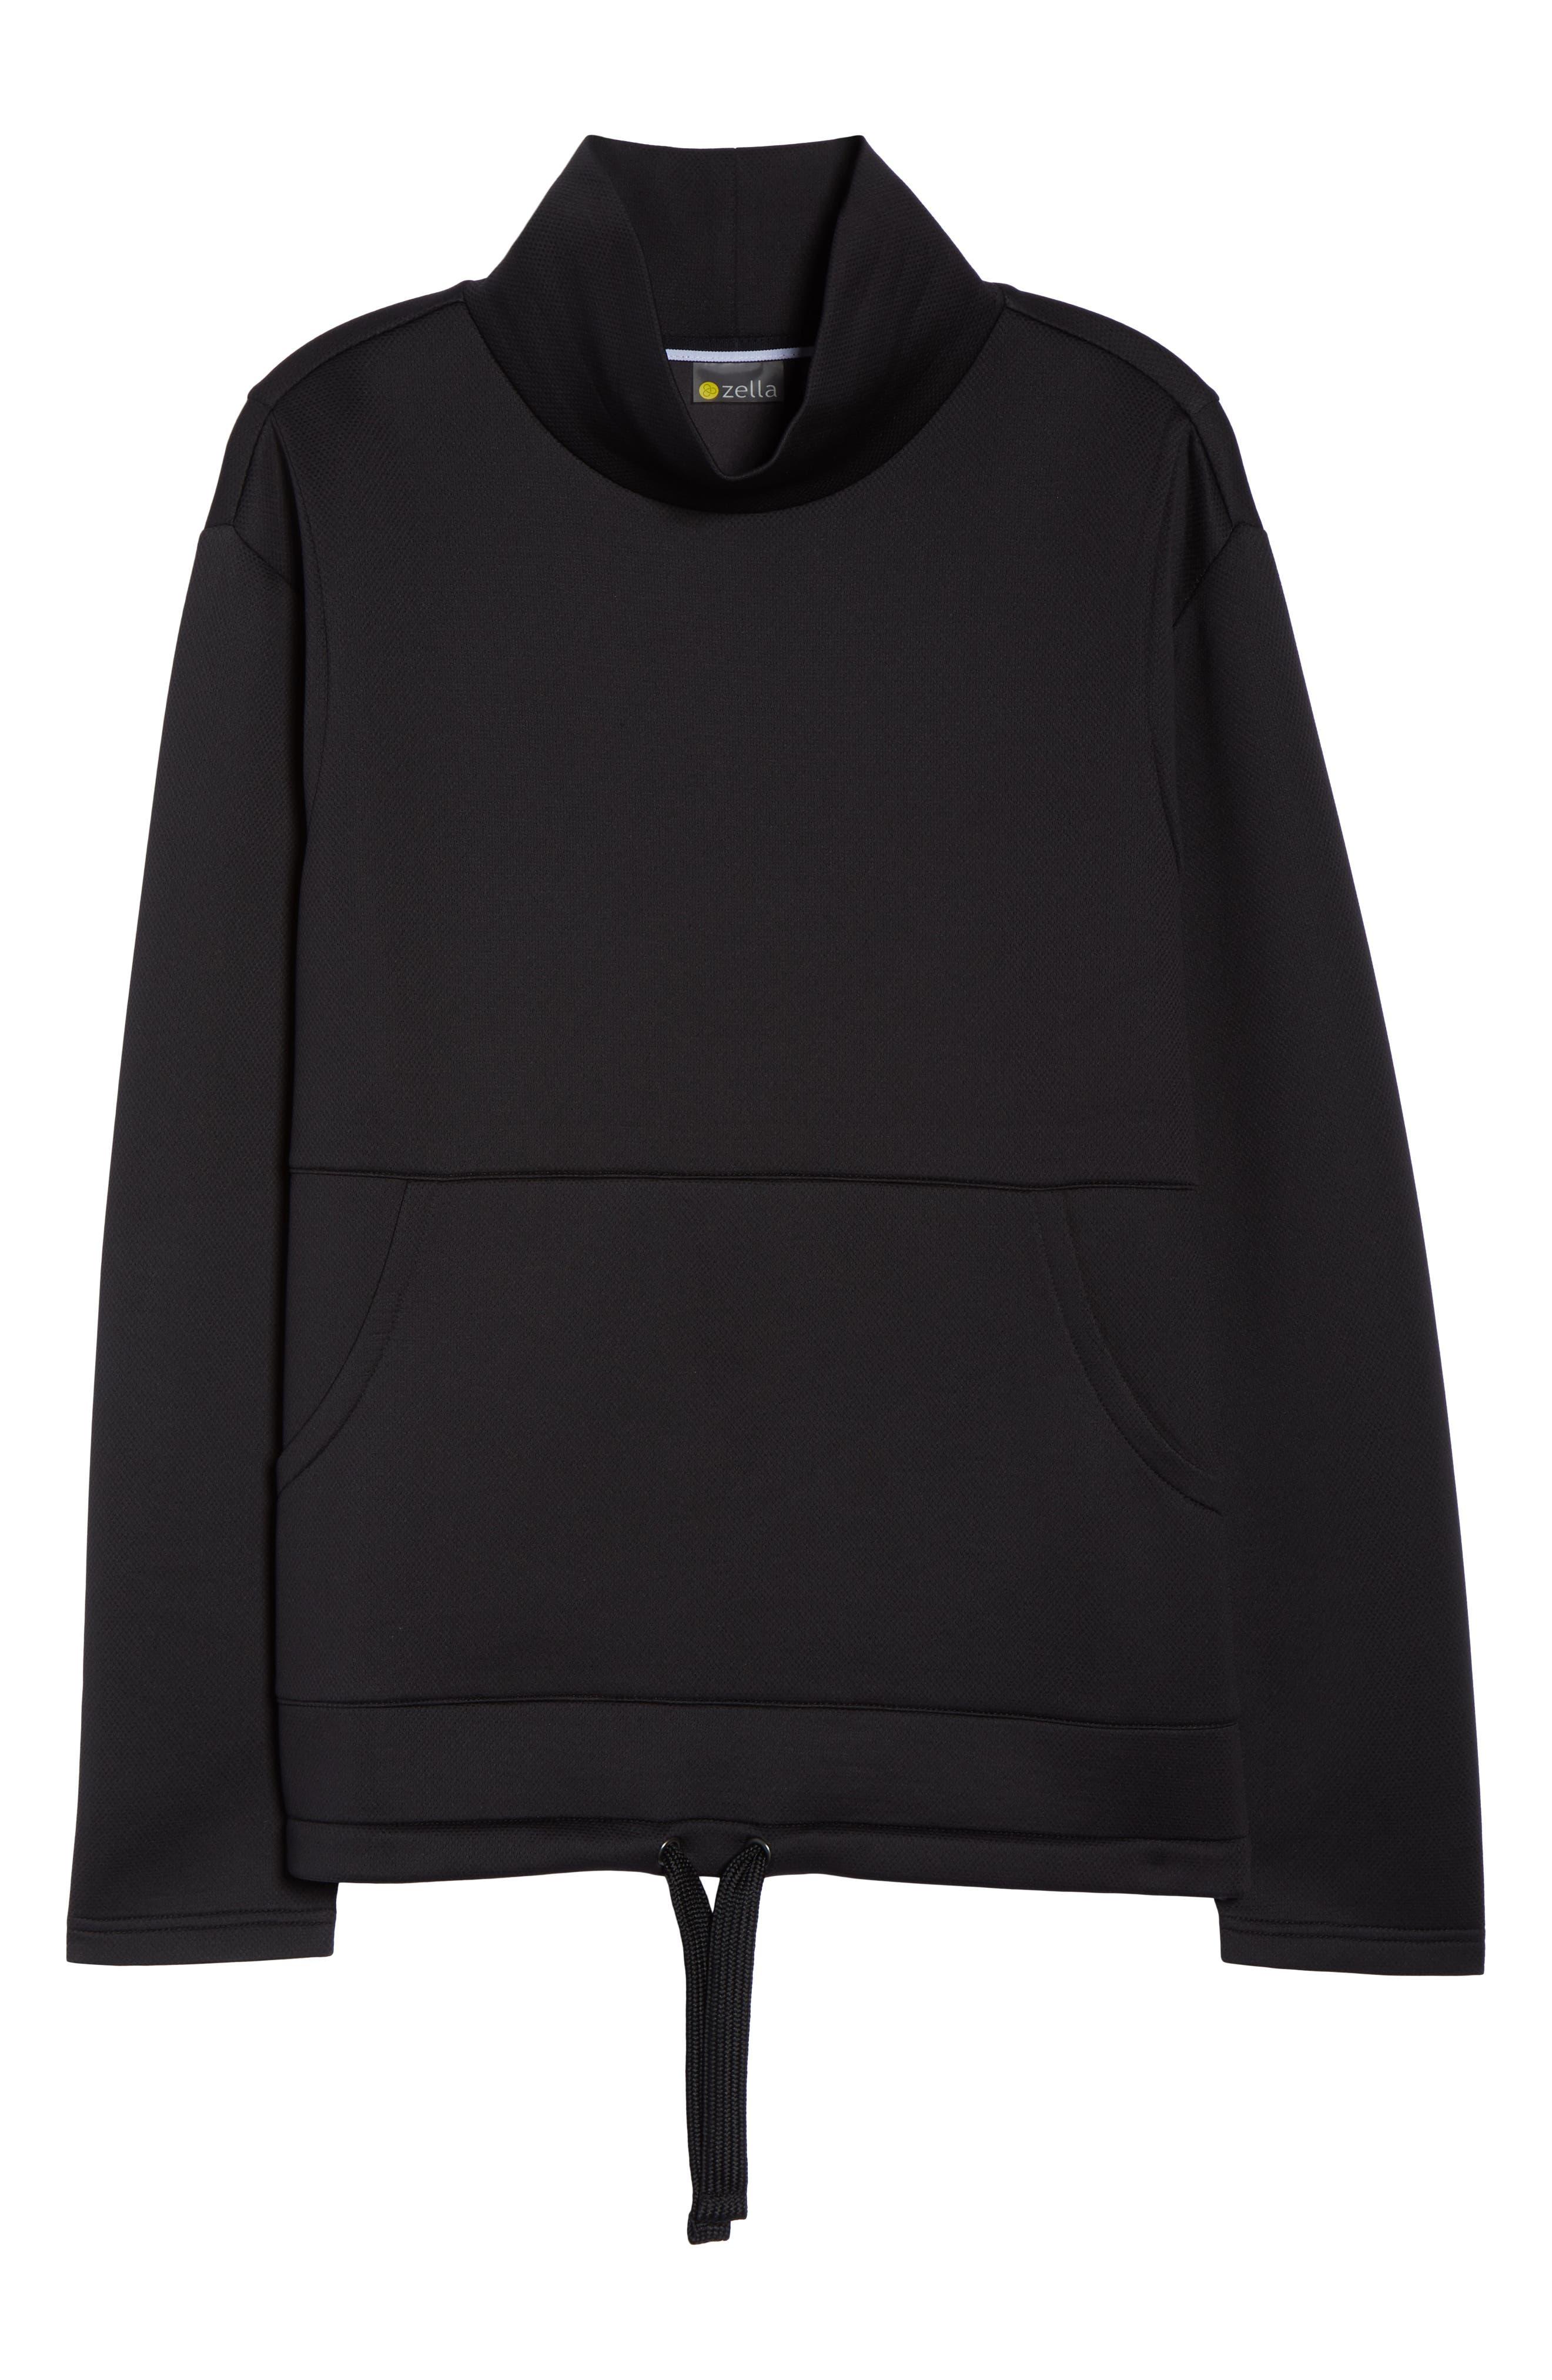 All About It Funnel Neck Sweatshirt,                             Alternate thumbnail 7, color,                             BLACK